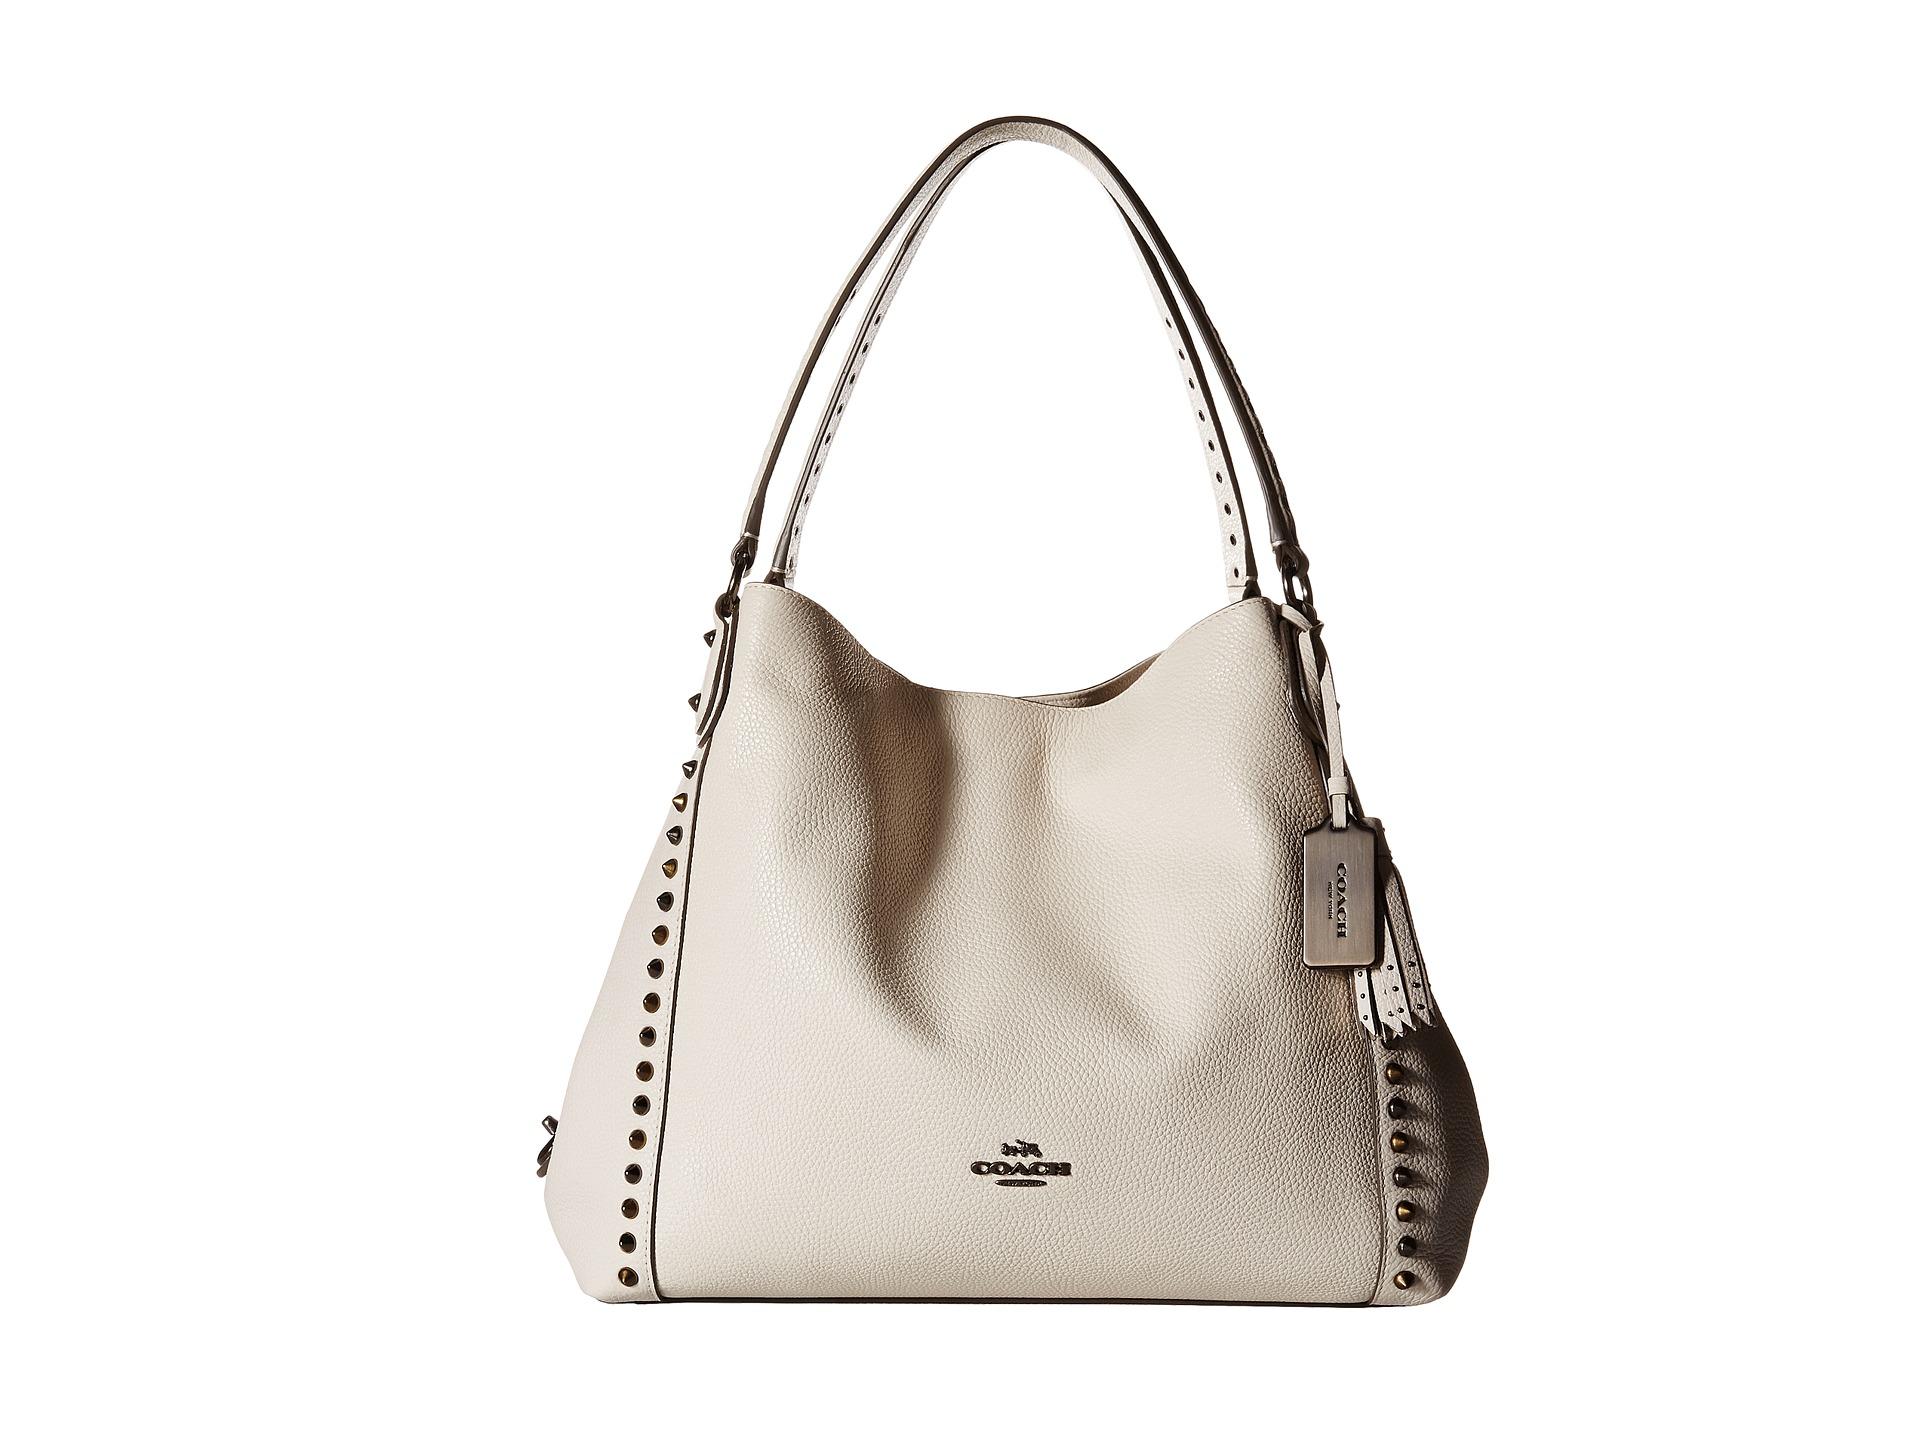 cc2ce13705 ... purchase lyst coach edie 31 shoulder bag in white 32ebb e9948